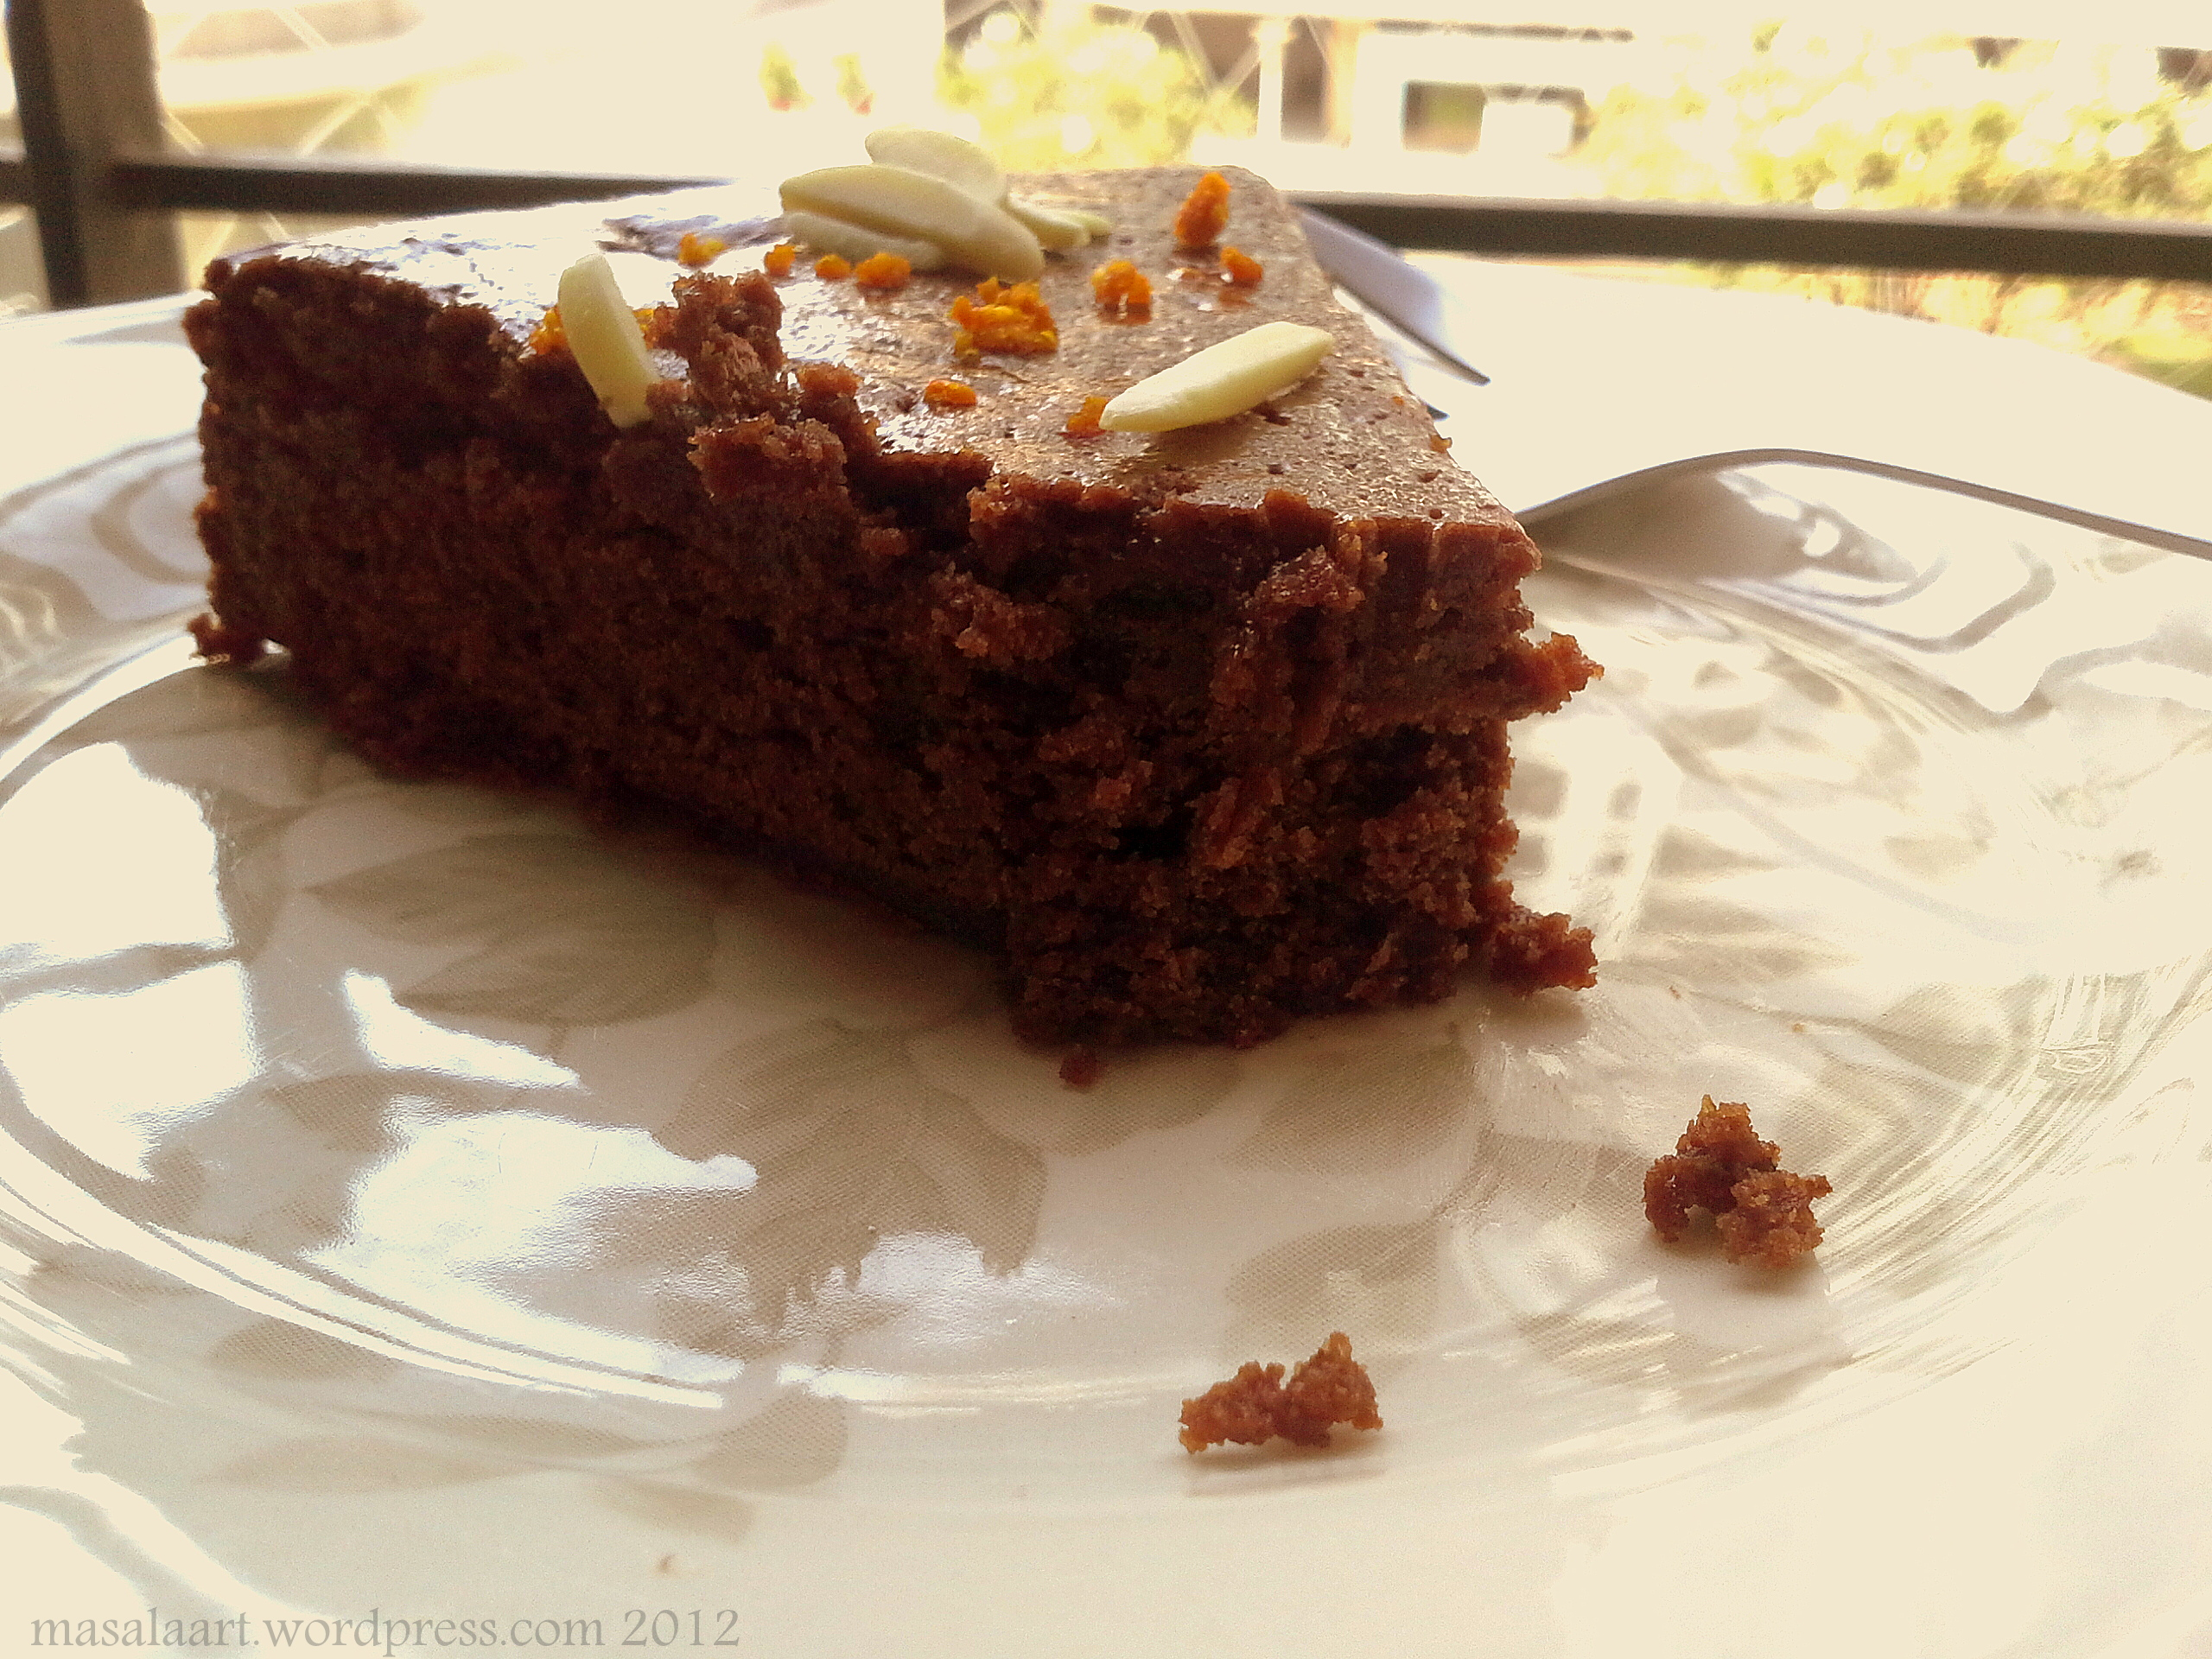 Chocolate Orange Cake Slice Crumbs